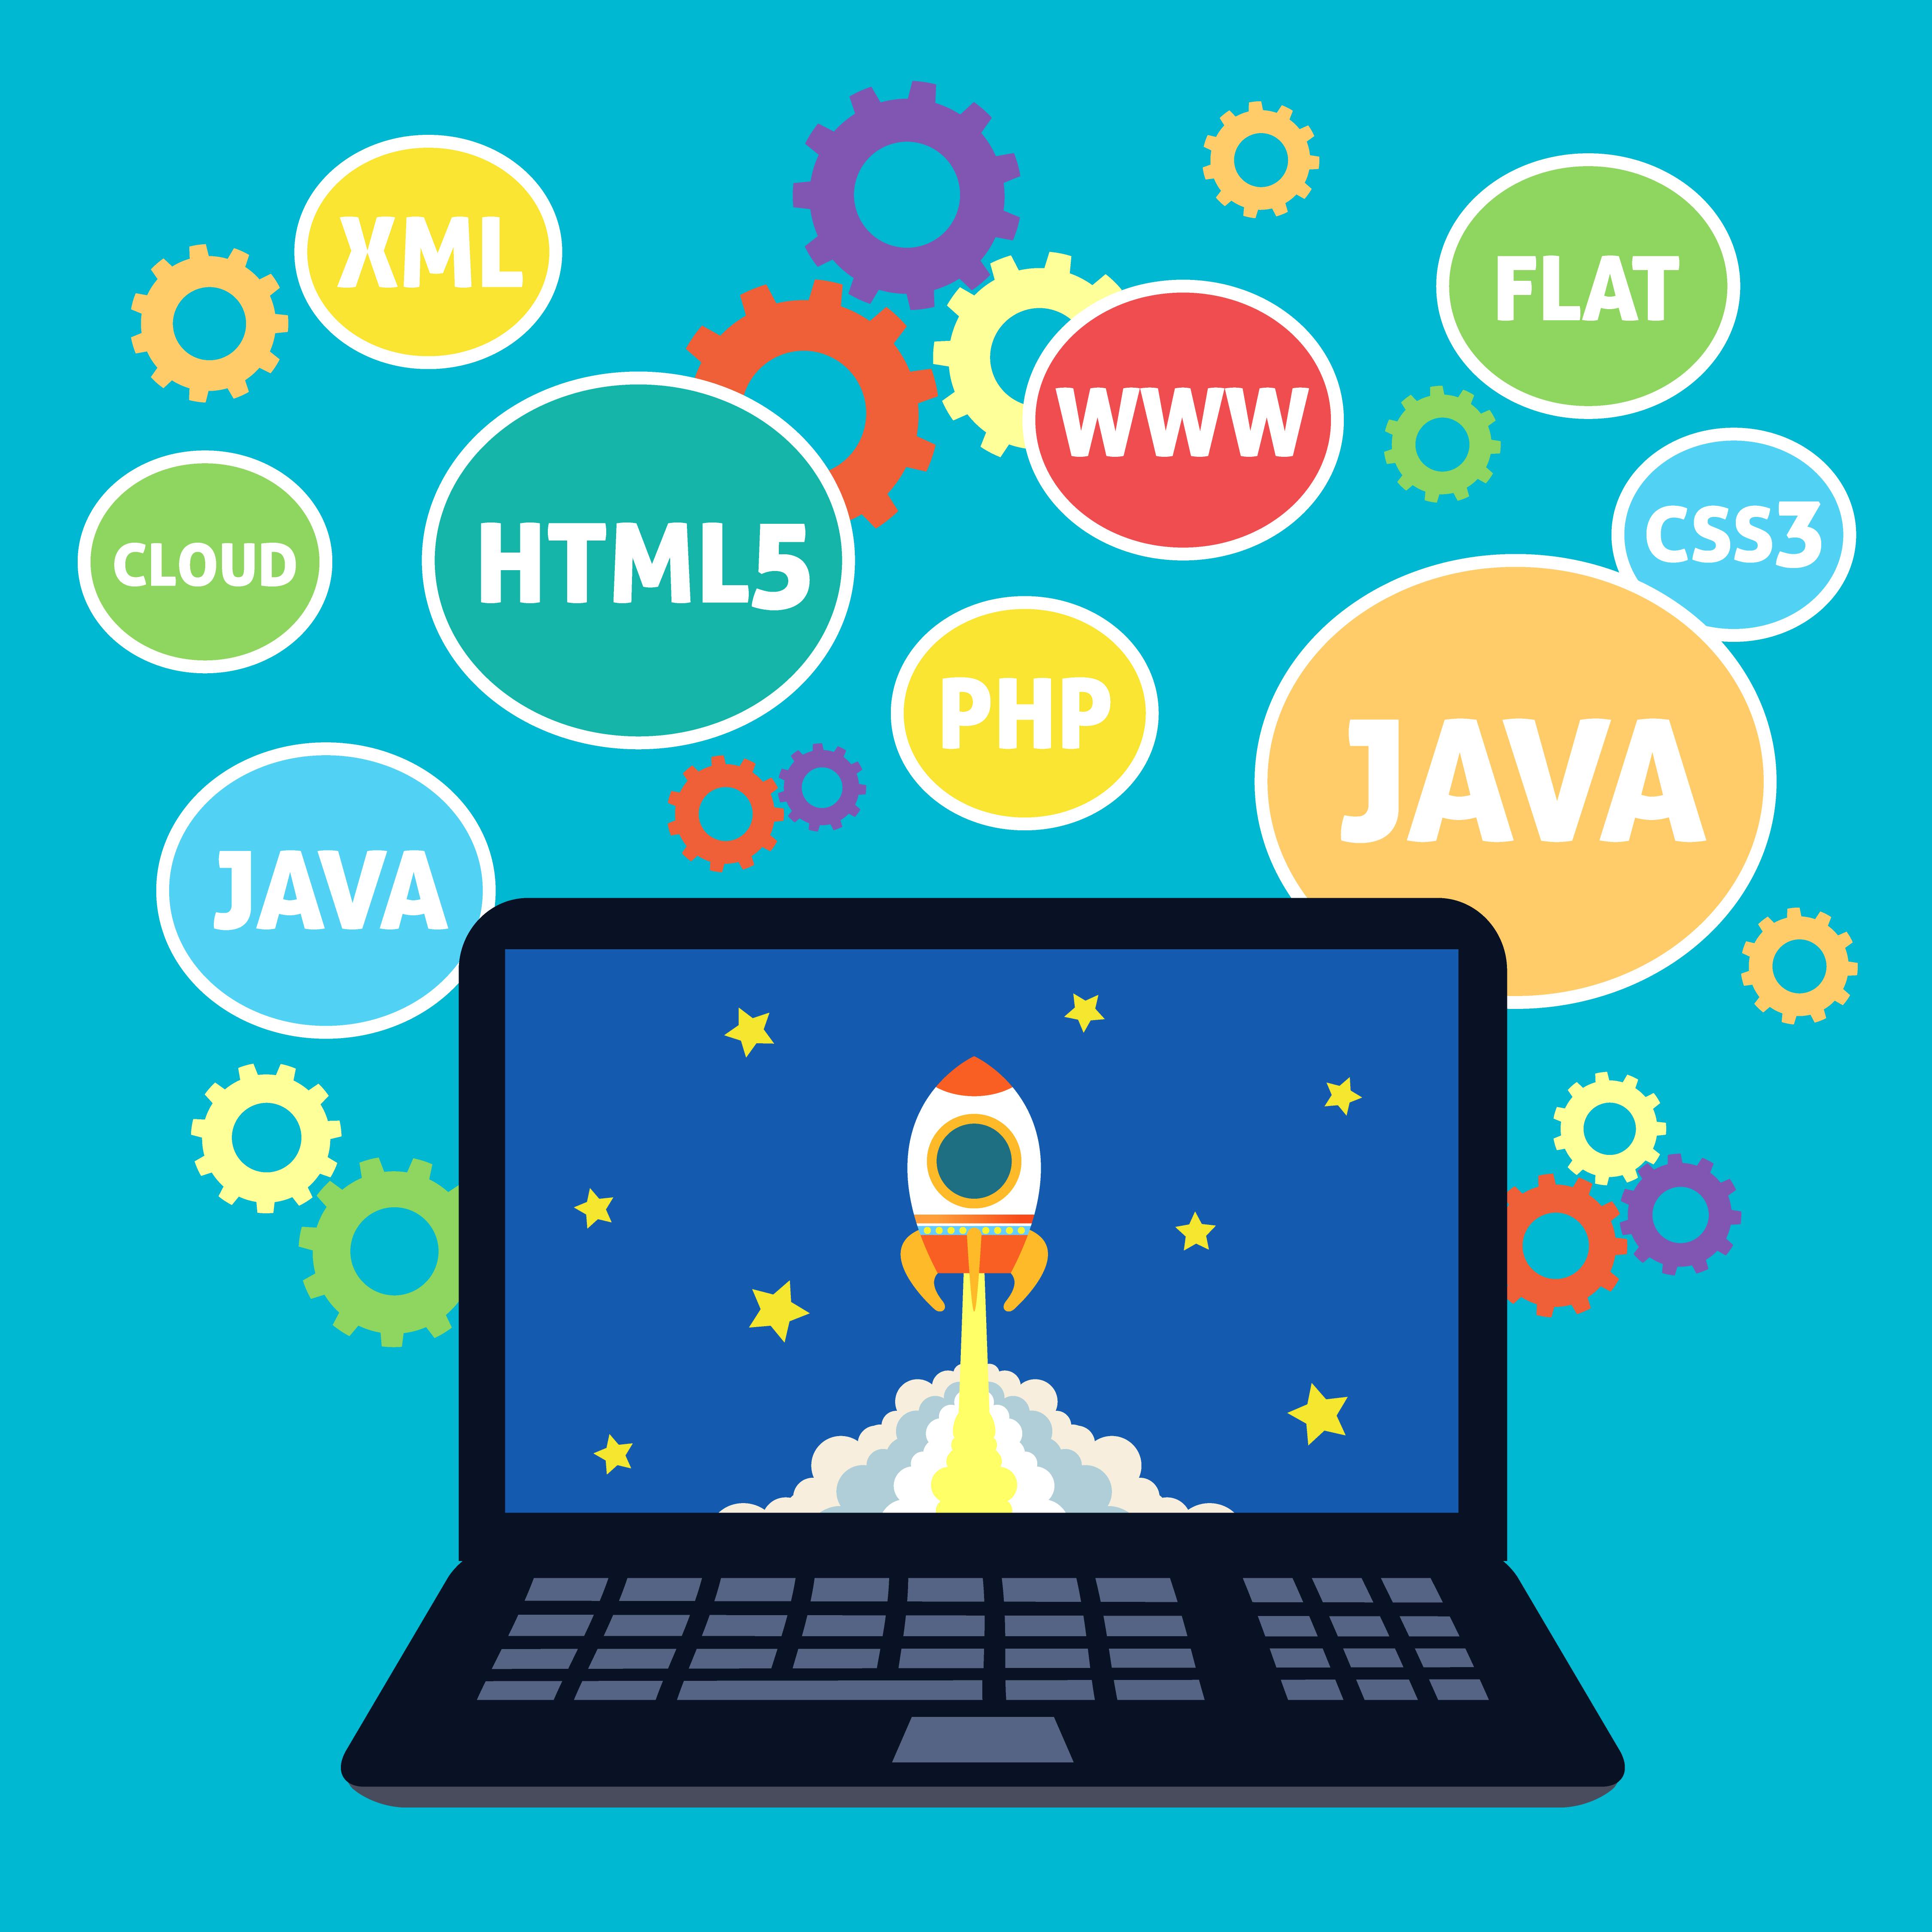 coding clipart java computer websites vector web website xml clip concept illustration html5 programming code embedded graphics illustrations part icon